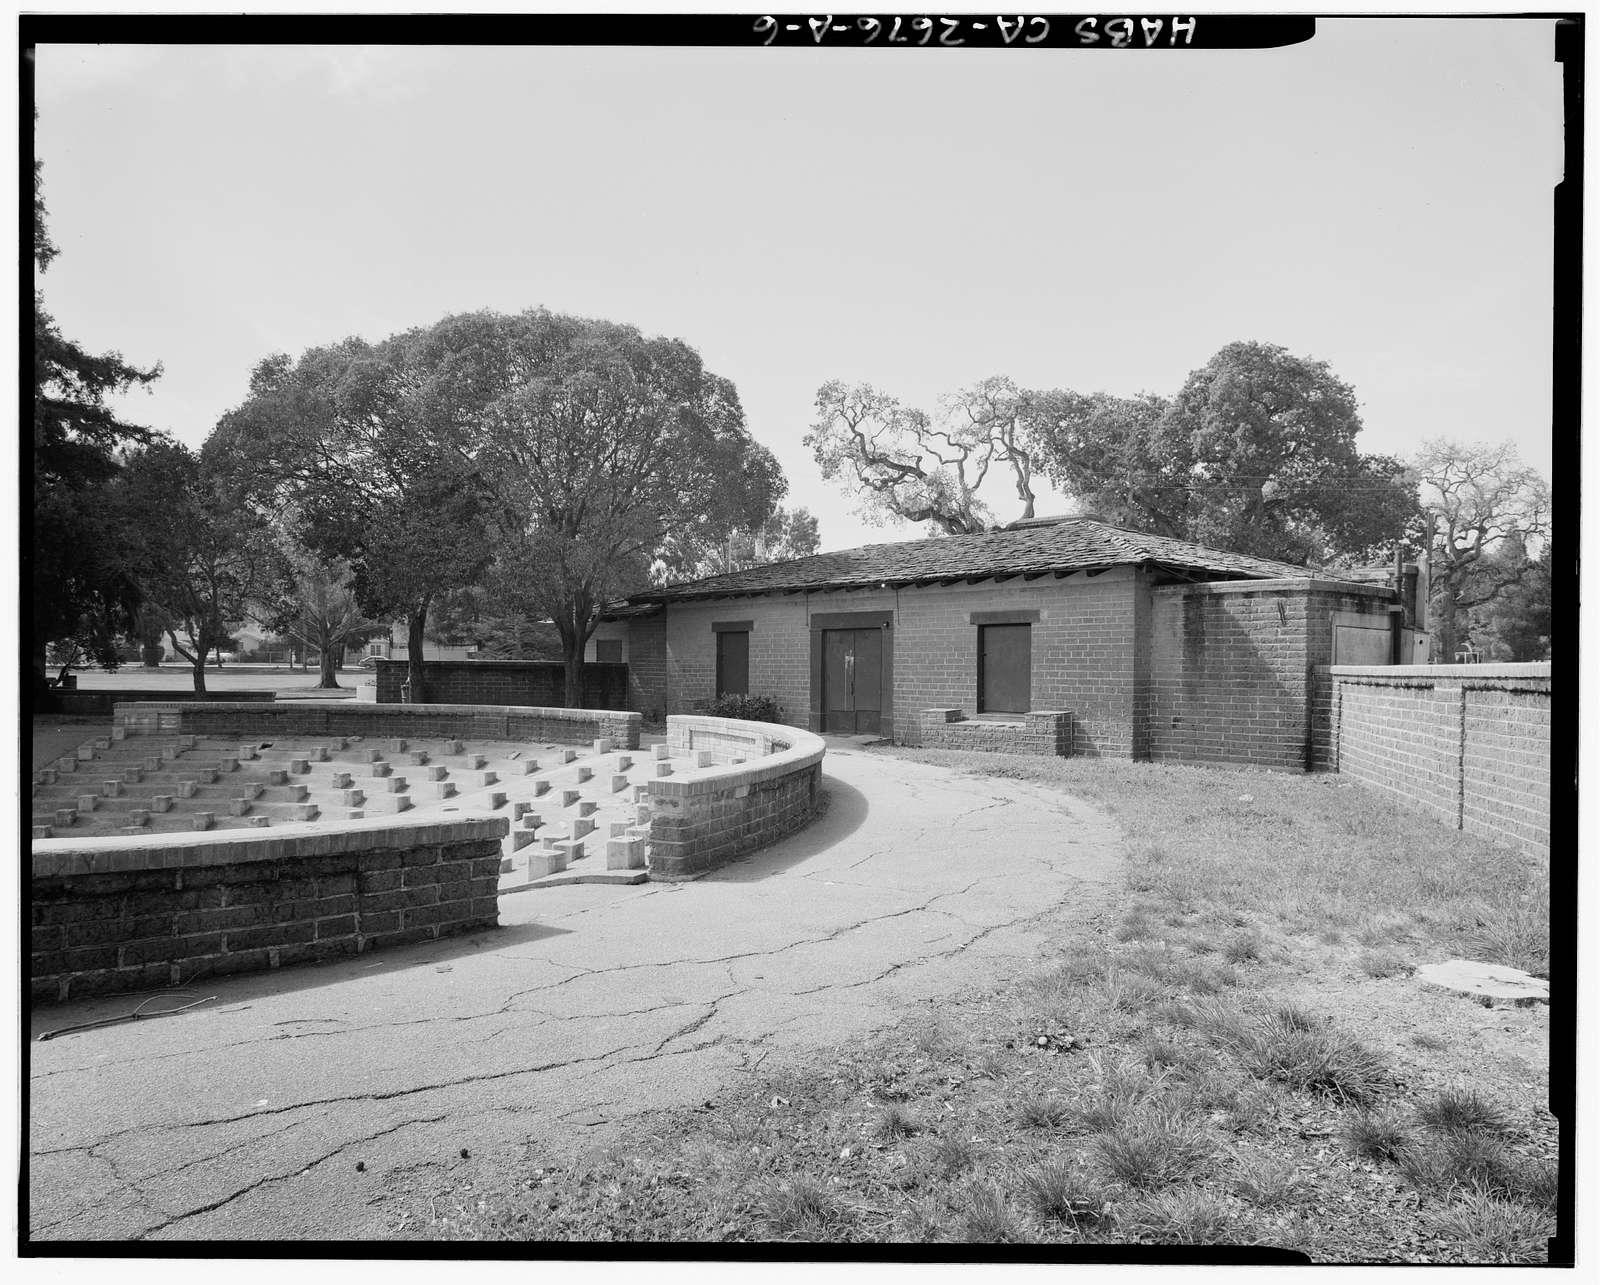 Burton Park, Club House & Amphitheater, Adjacent ot south end of Chestnut Avenue, San Carlos, San Mateo County, CA